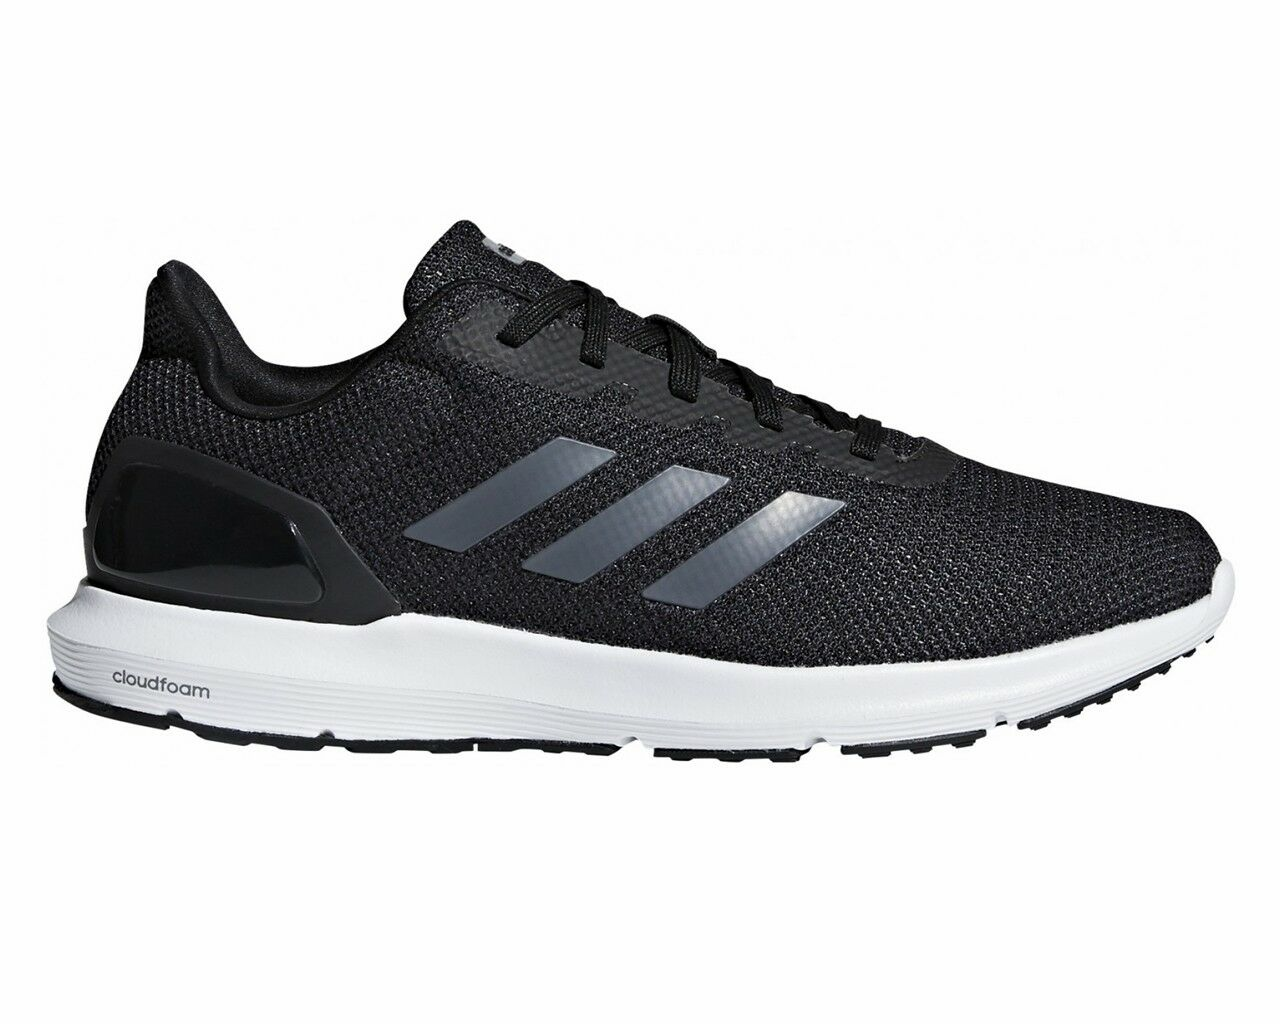 Adidas Cosmic 2 Cloudfoam DB1758 Mens Trainers Black